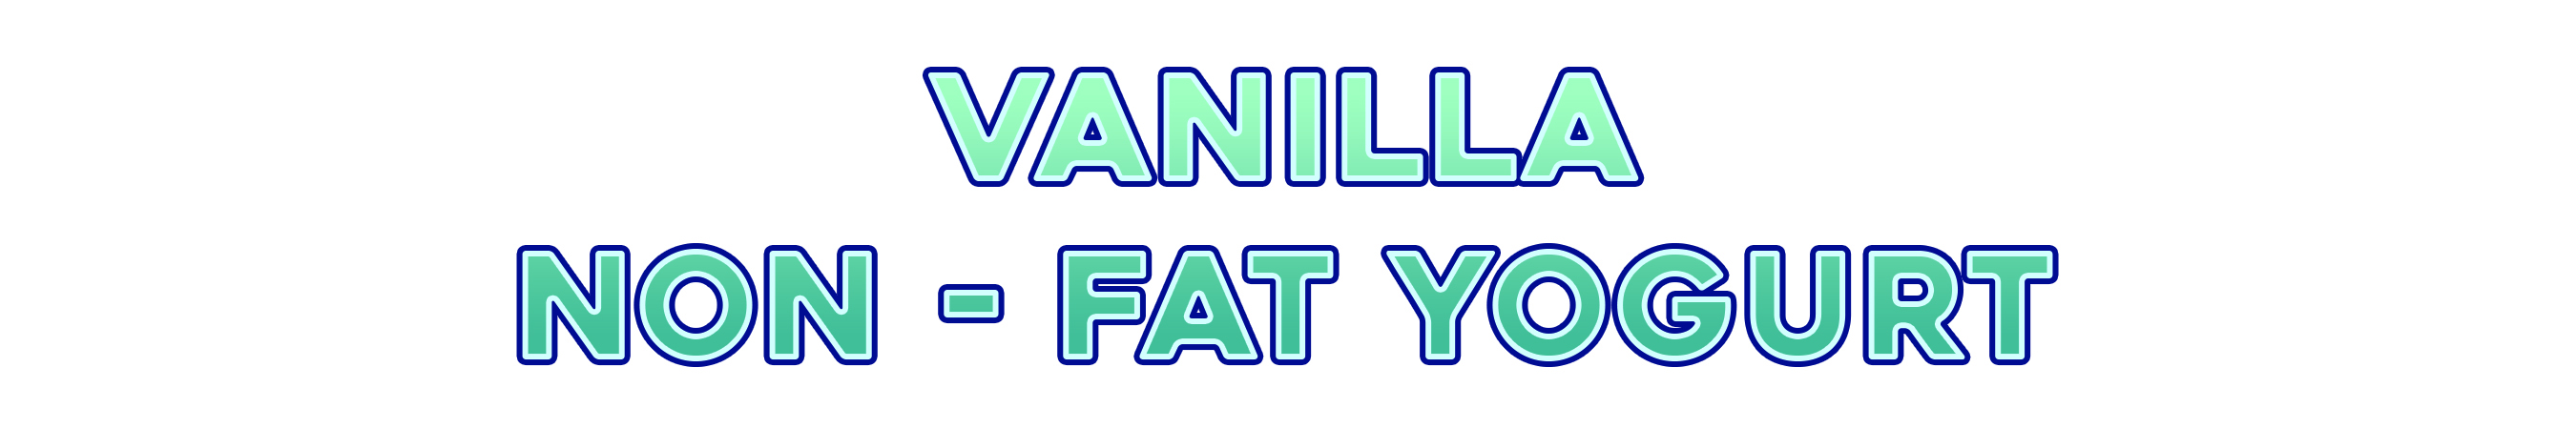 VanillaYogurt